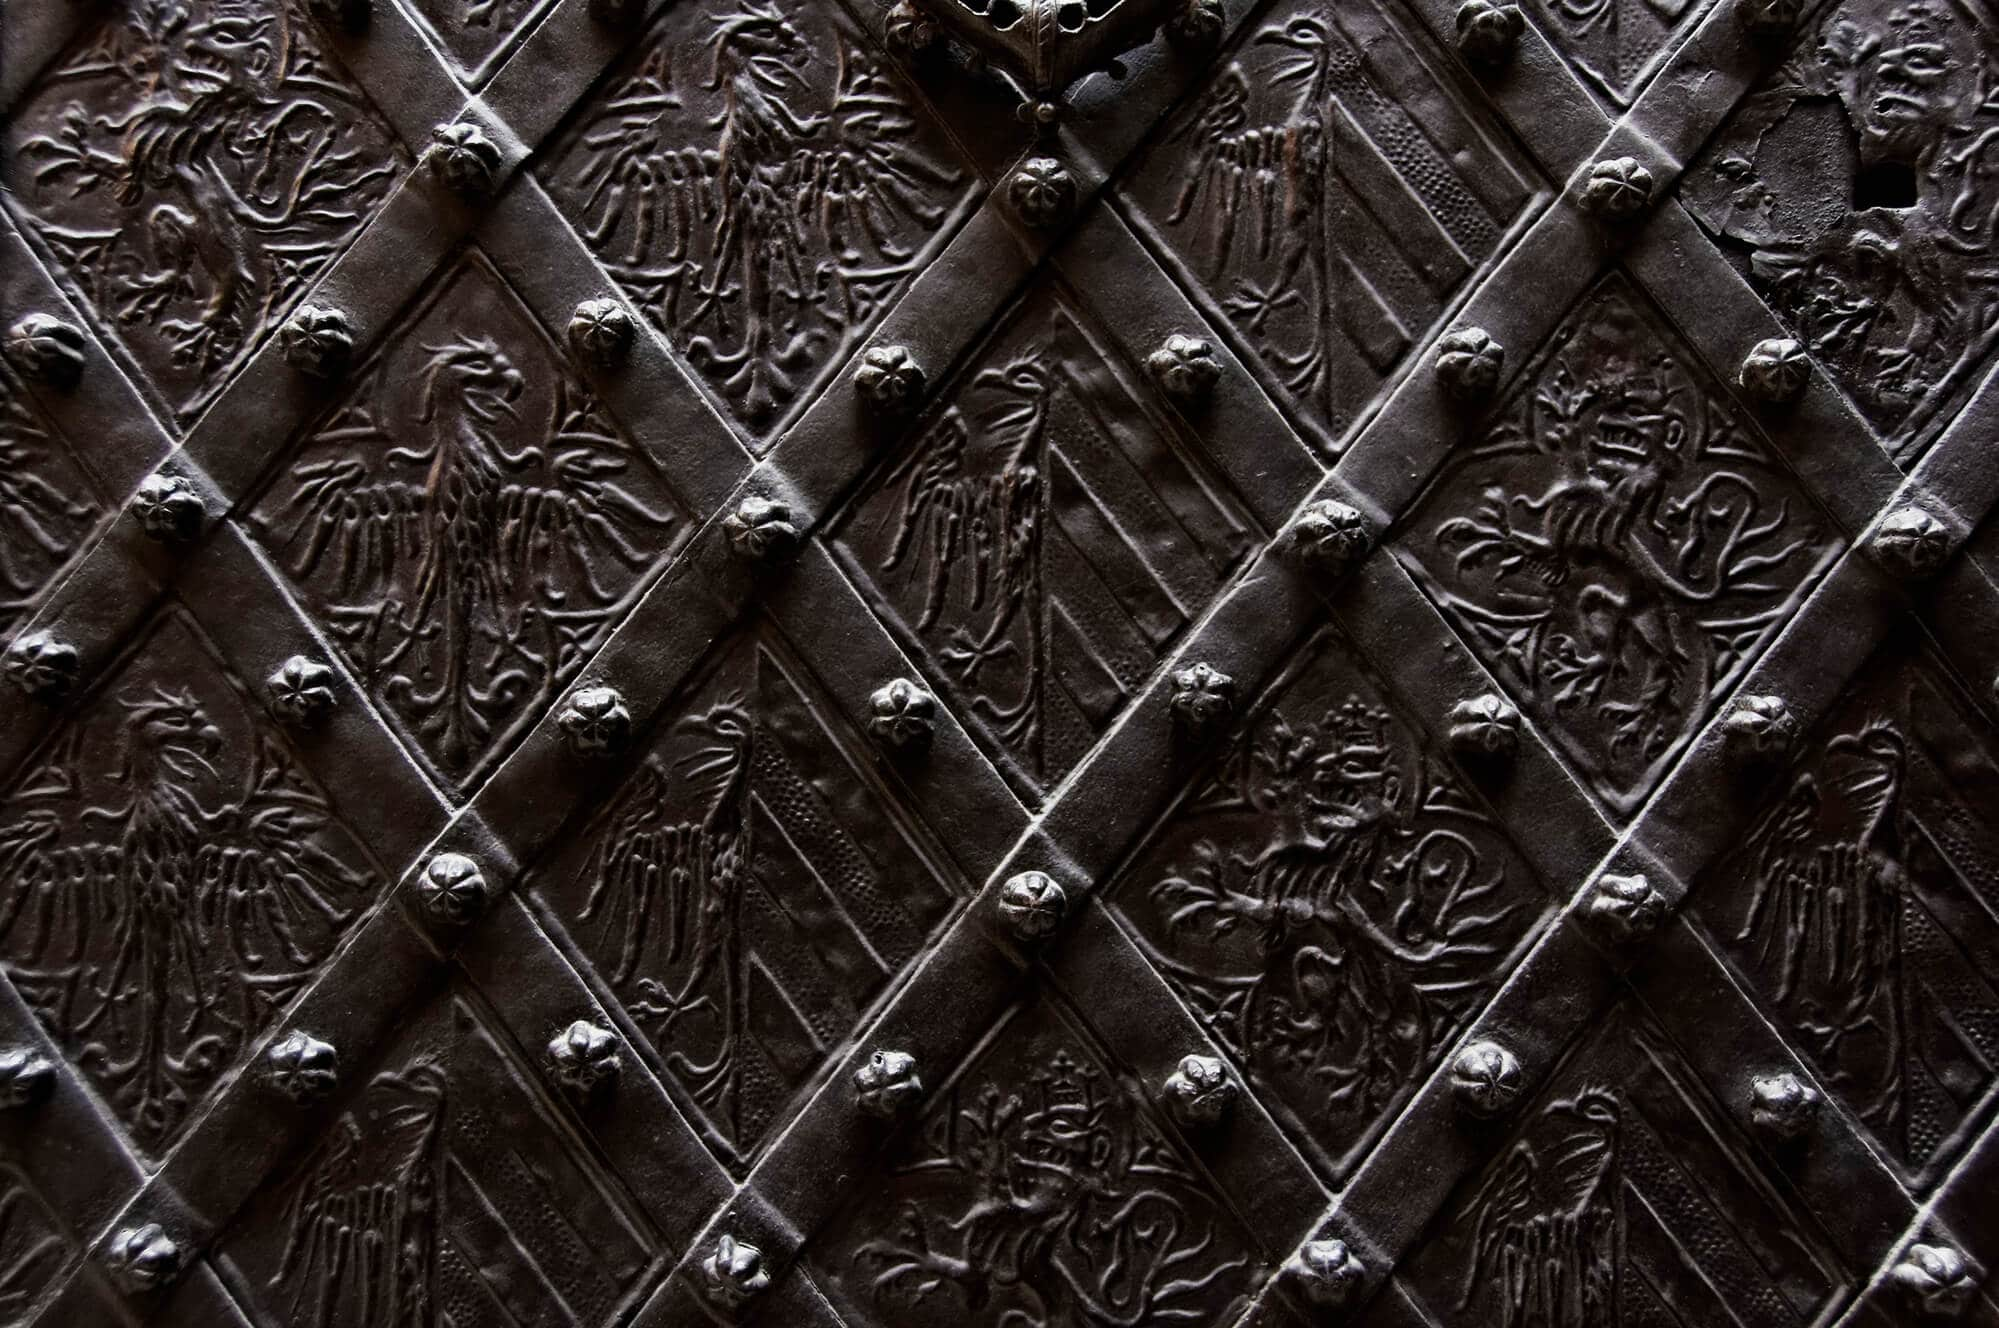 Wrought Iron Background - Big Easy Iron Works